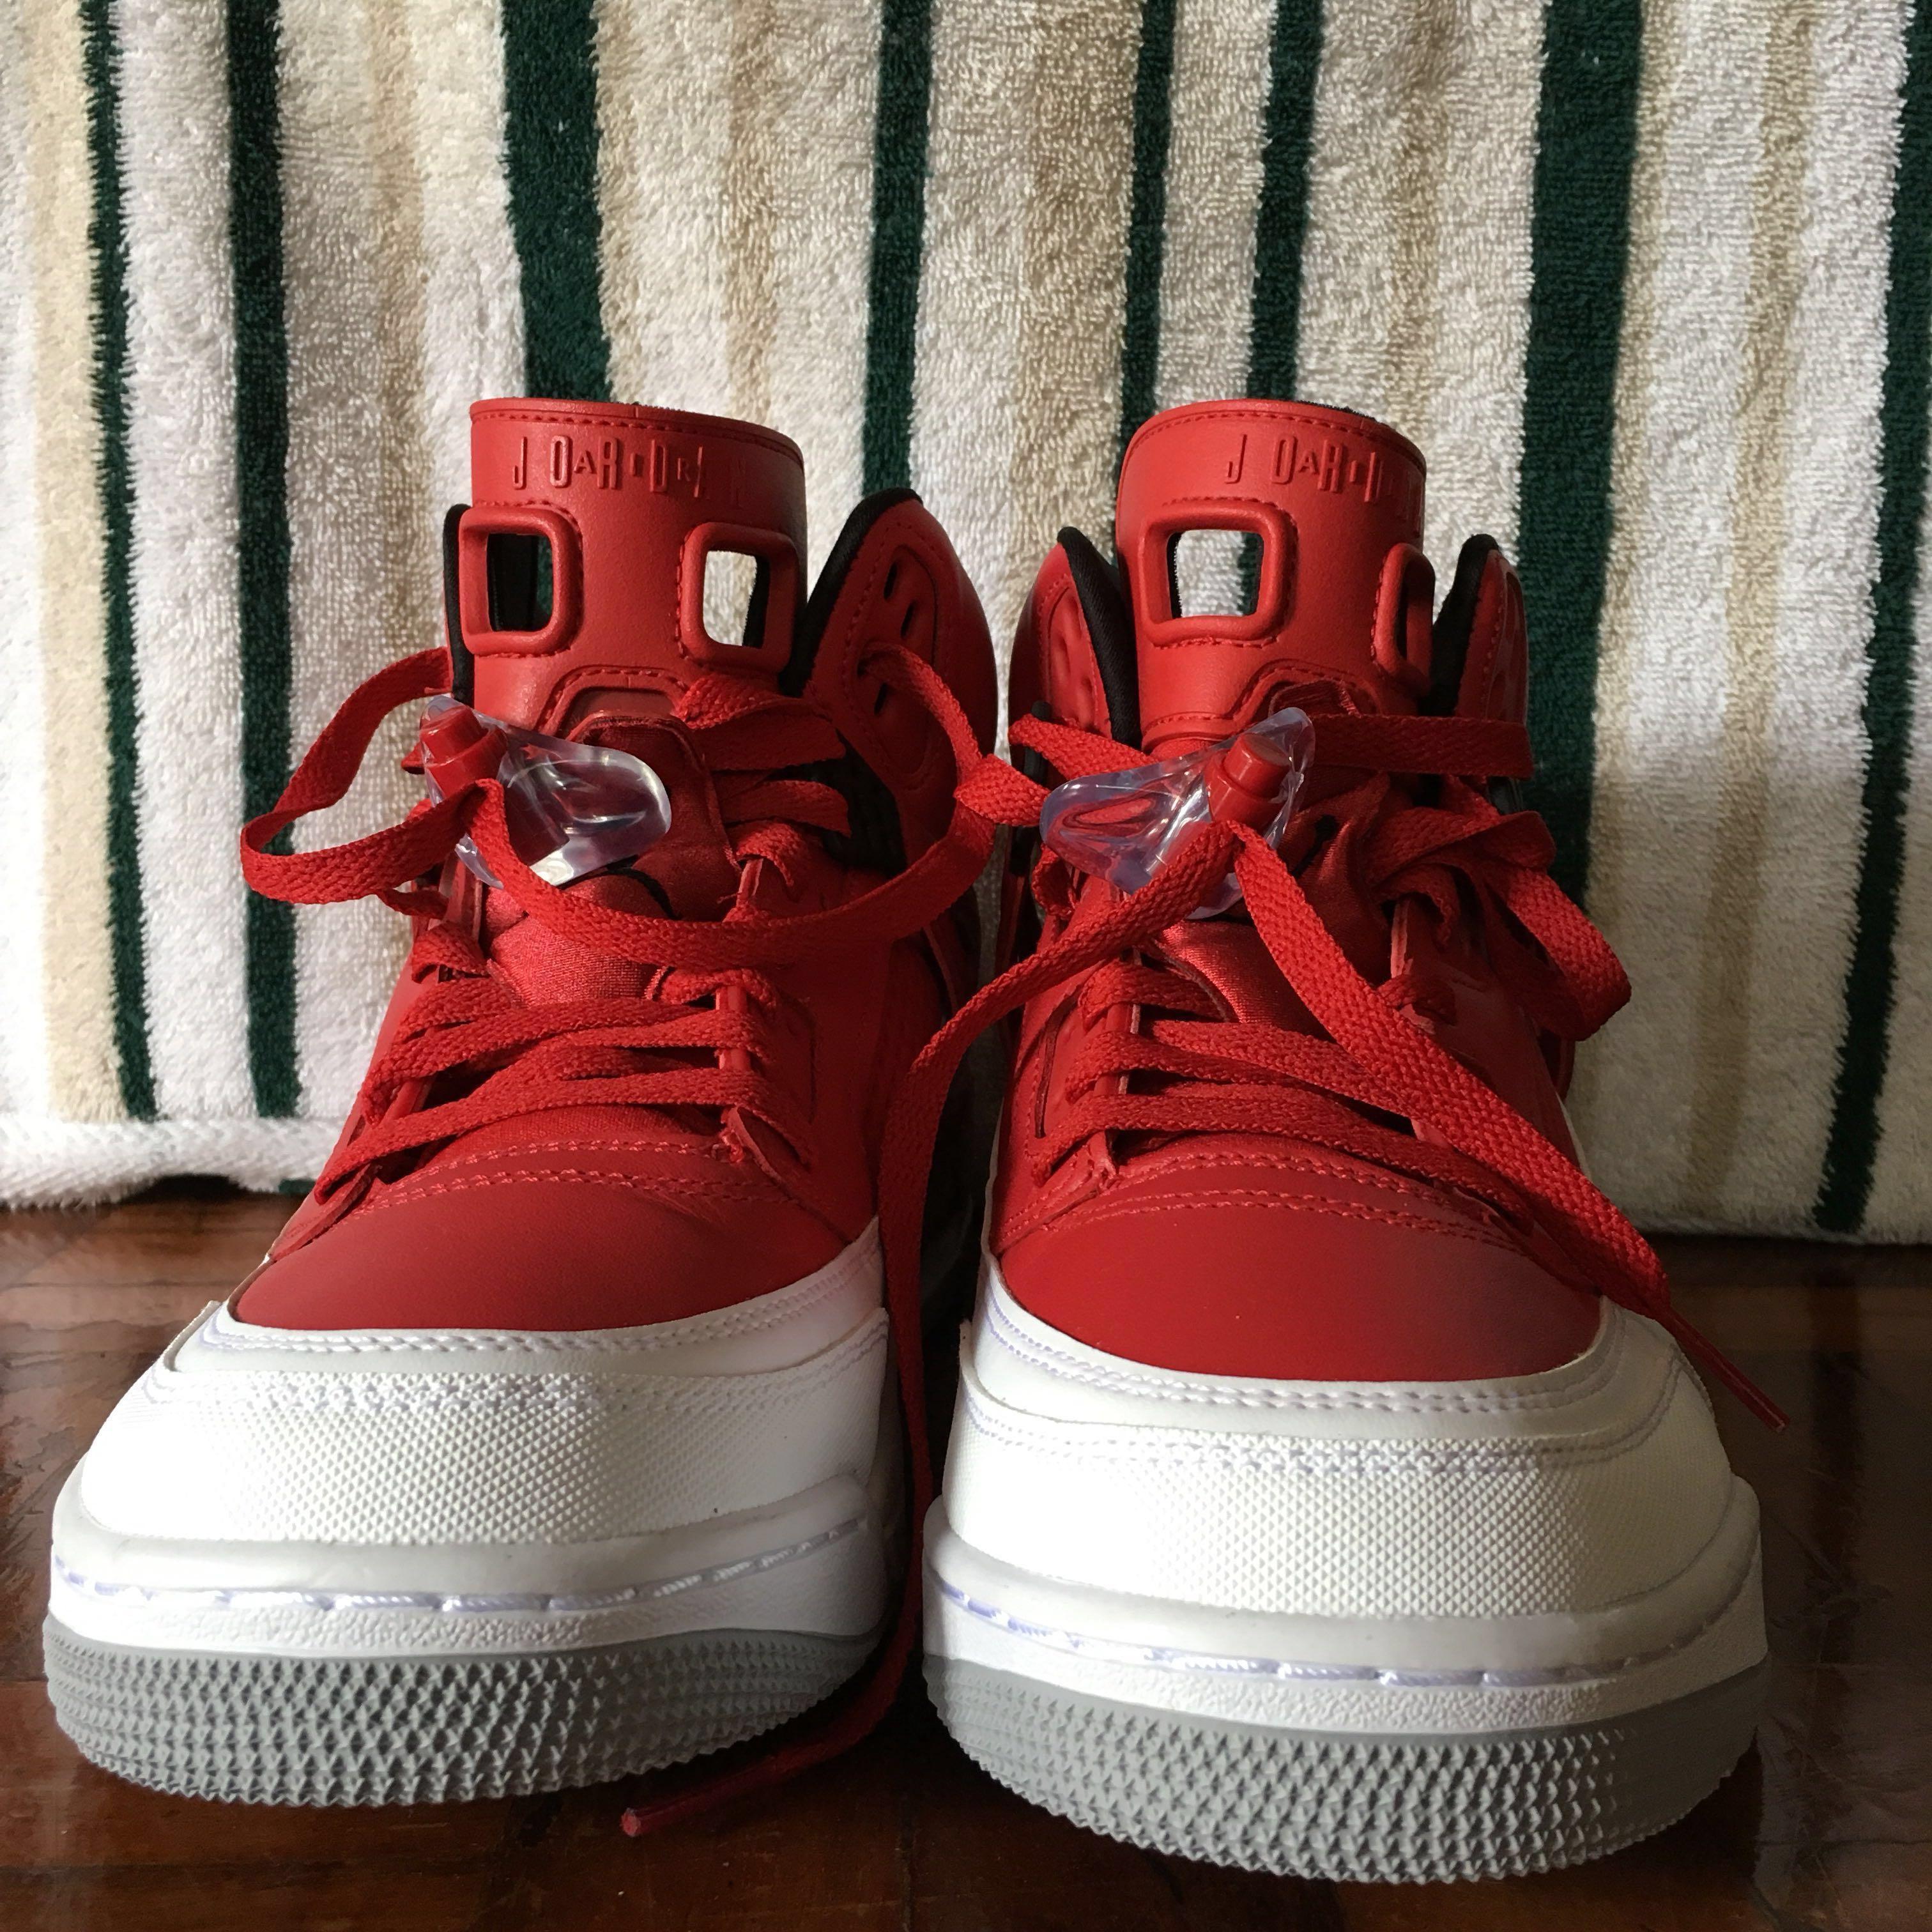 c1218d3a422b ... australia jordan spizike red and white mens fashion footwear on  carousell f0fb0 3fd4b